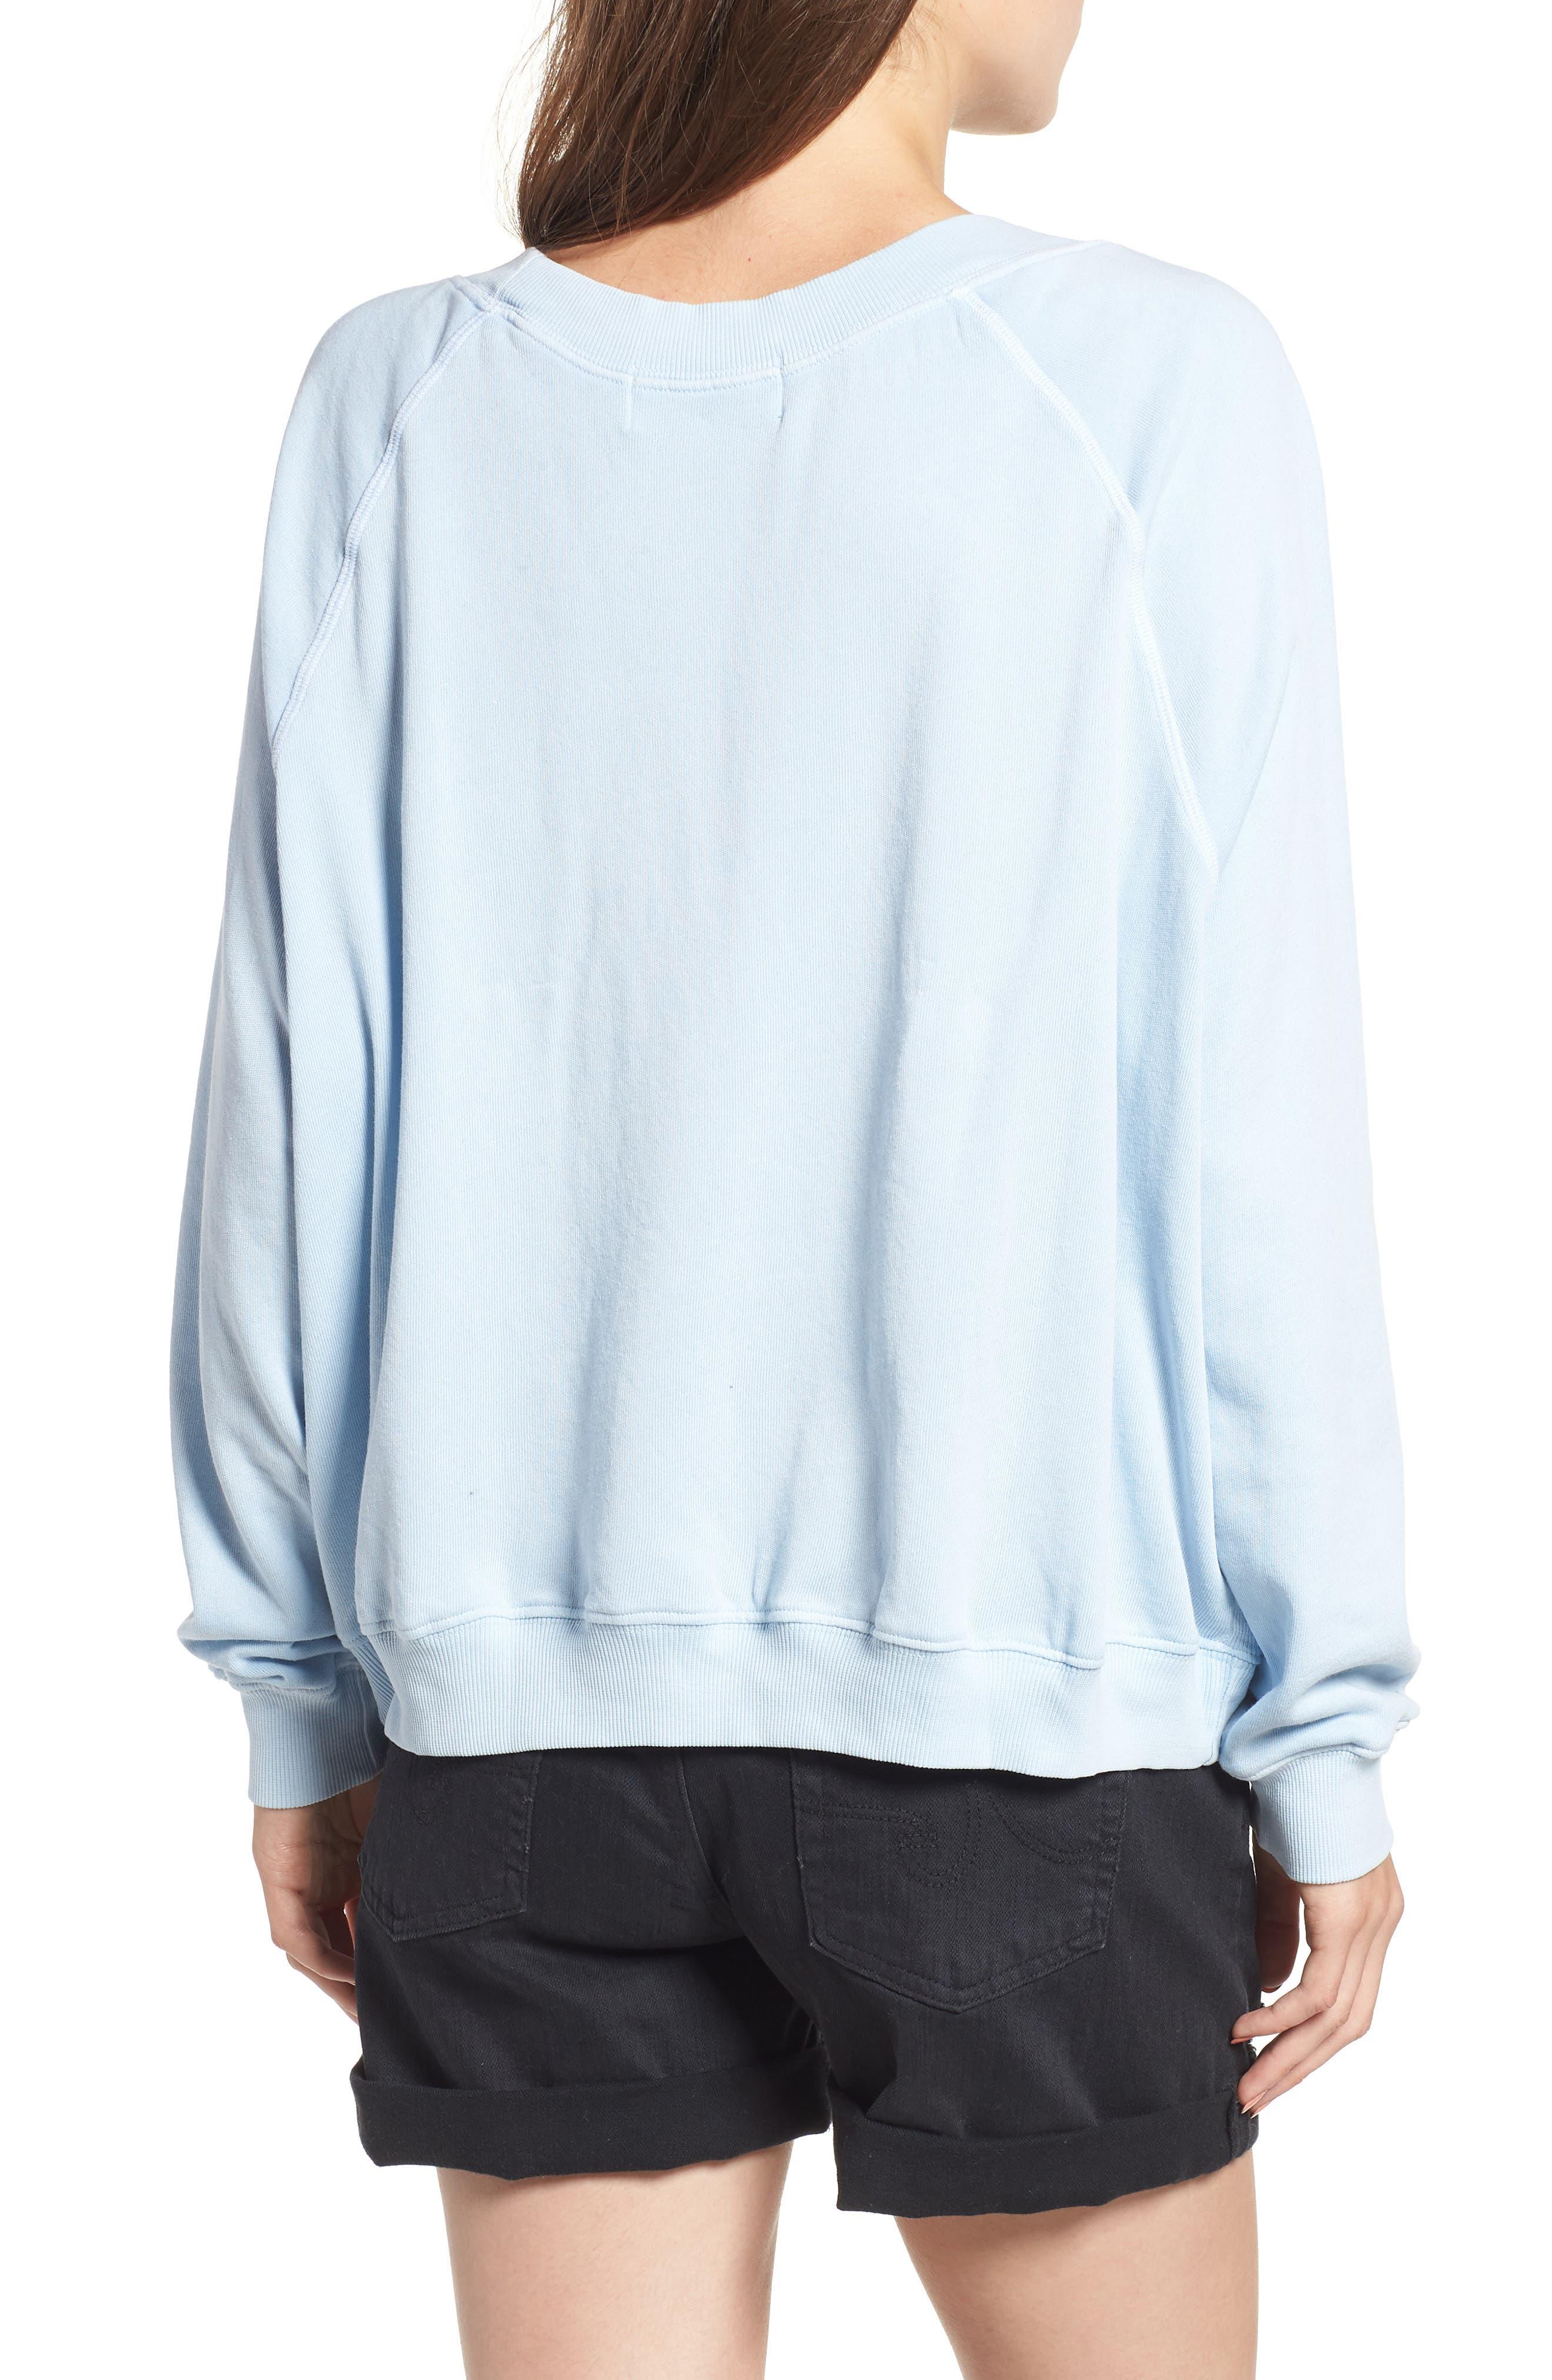 Malibu Crest Sommers Sweatshirt,                             Alternate thumbnail 2, color,                             400